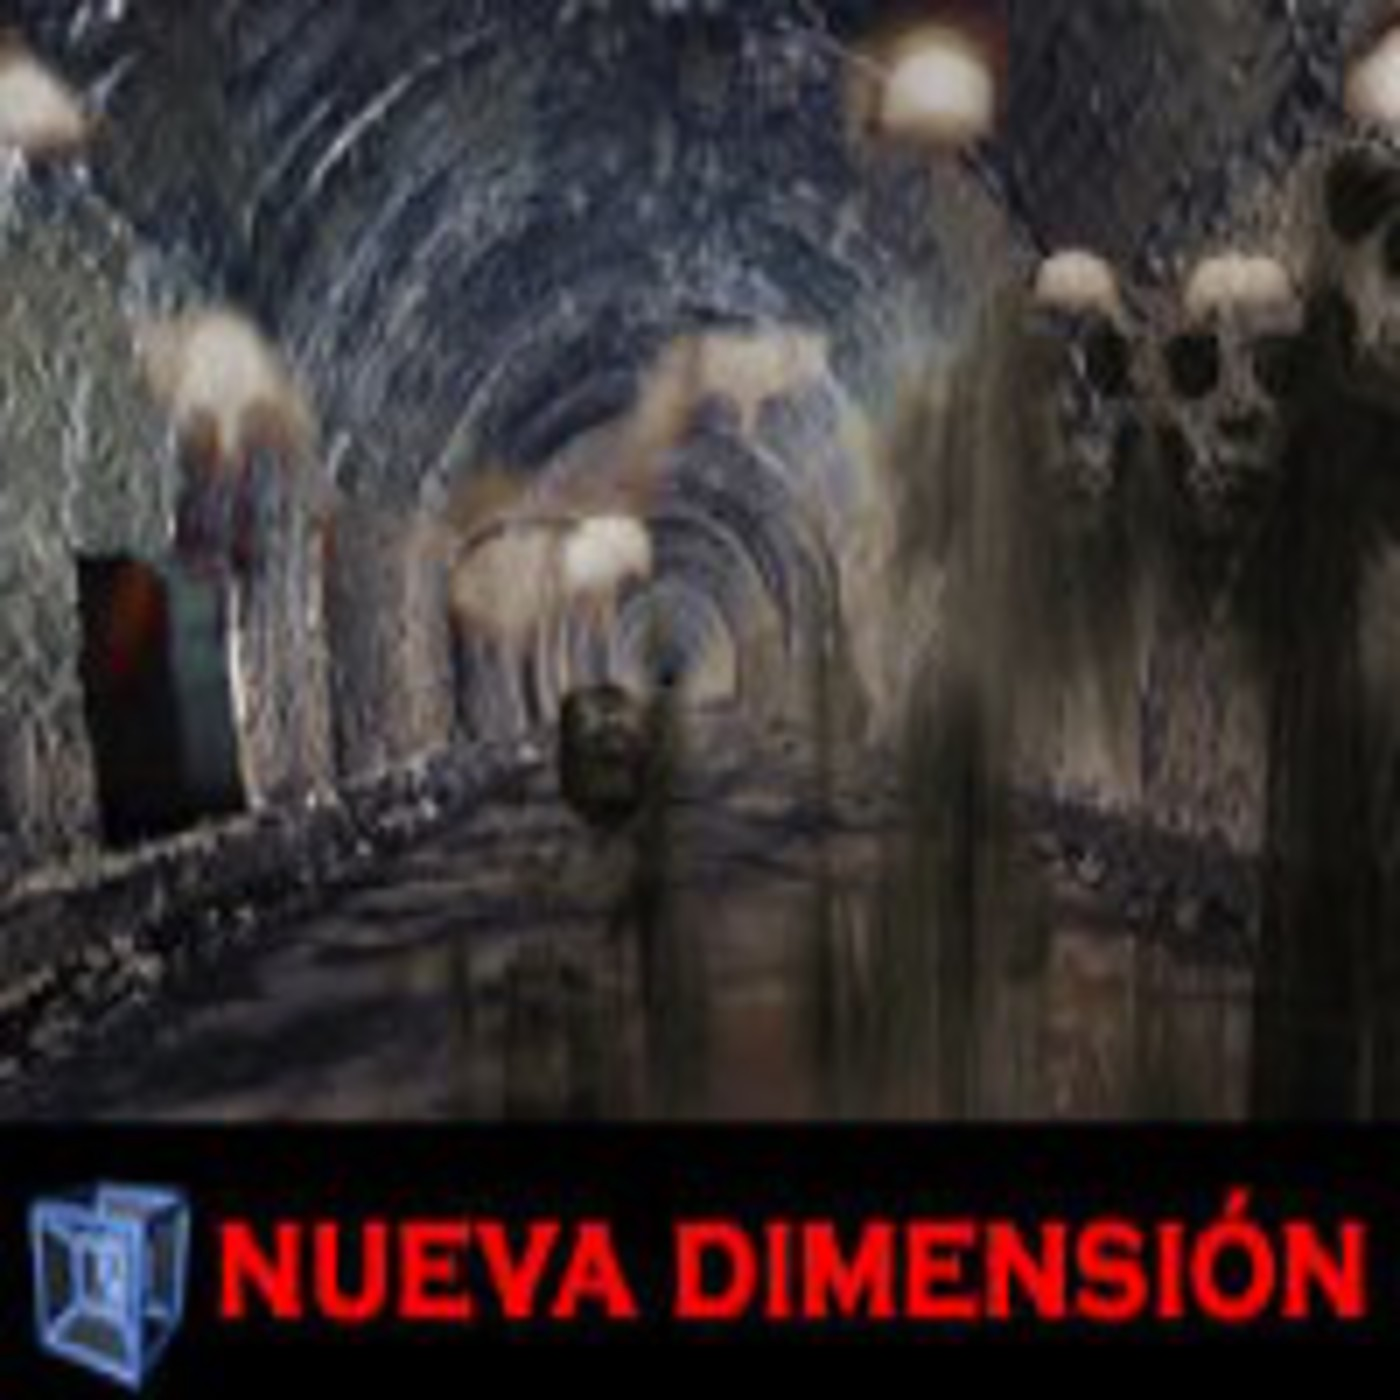 Nueva Dimension Viaje Al Secreto Del Tunel De La Engana La